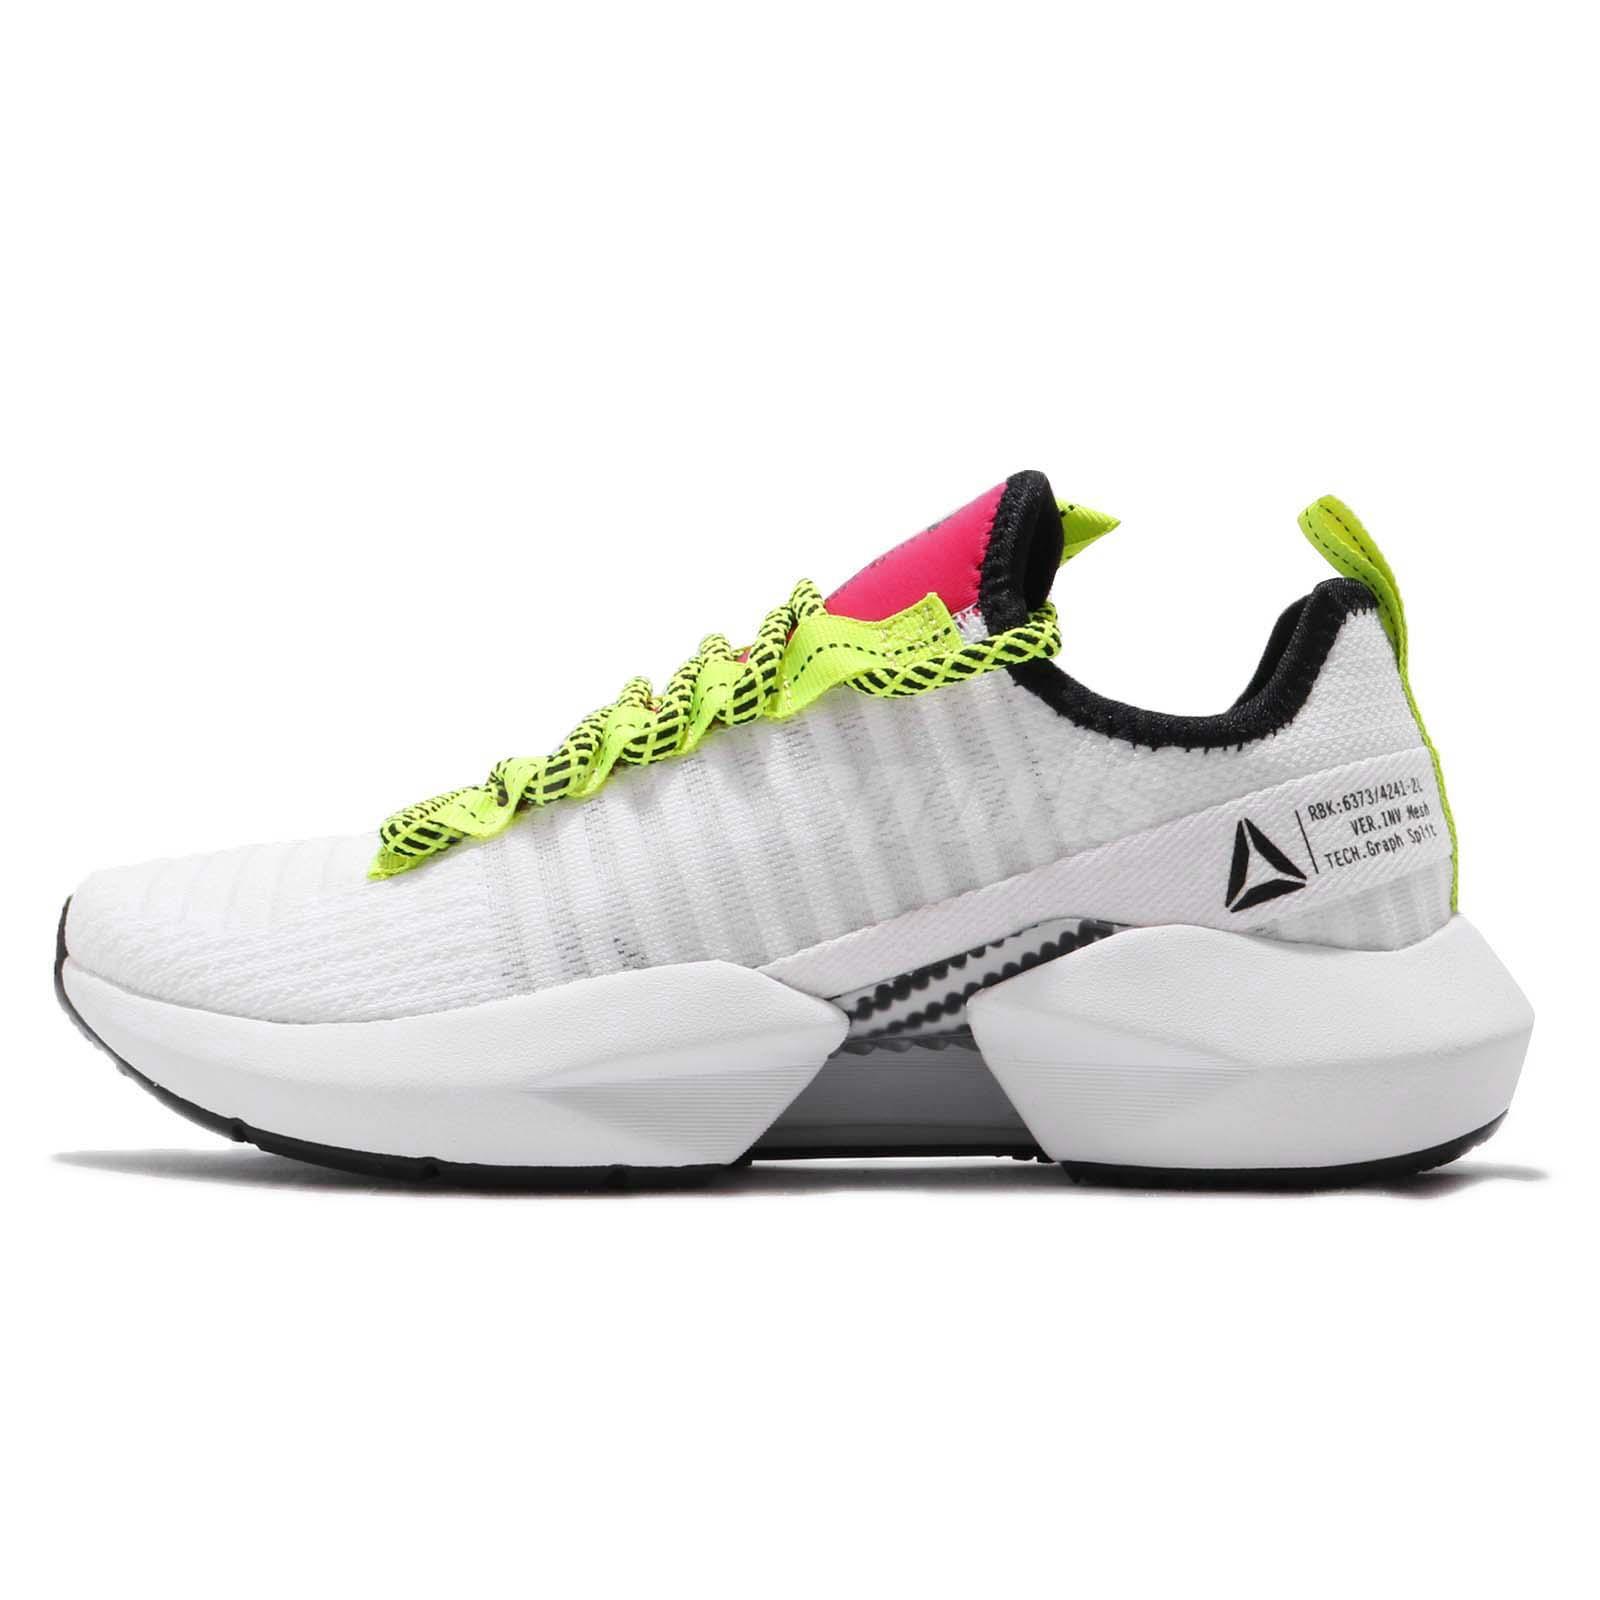 3a1161e31b3c Reebok Sole Fury White Black Lime Red Women Running Fashion Shoes Sneaker  DV4490